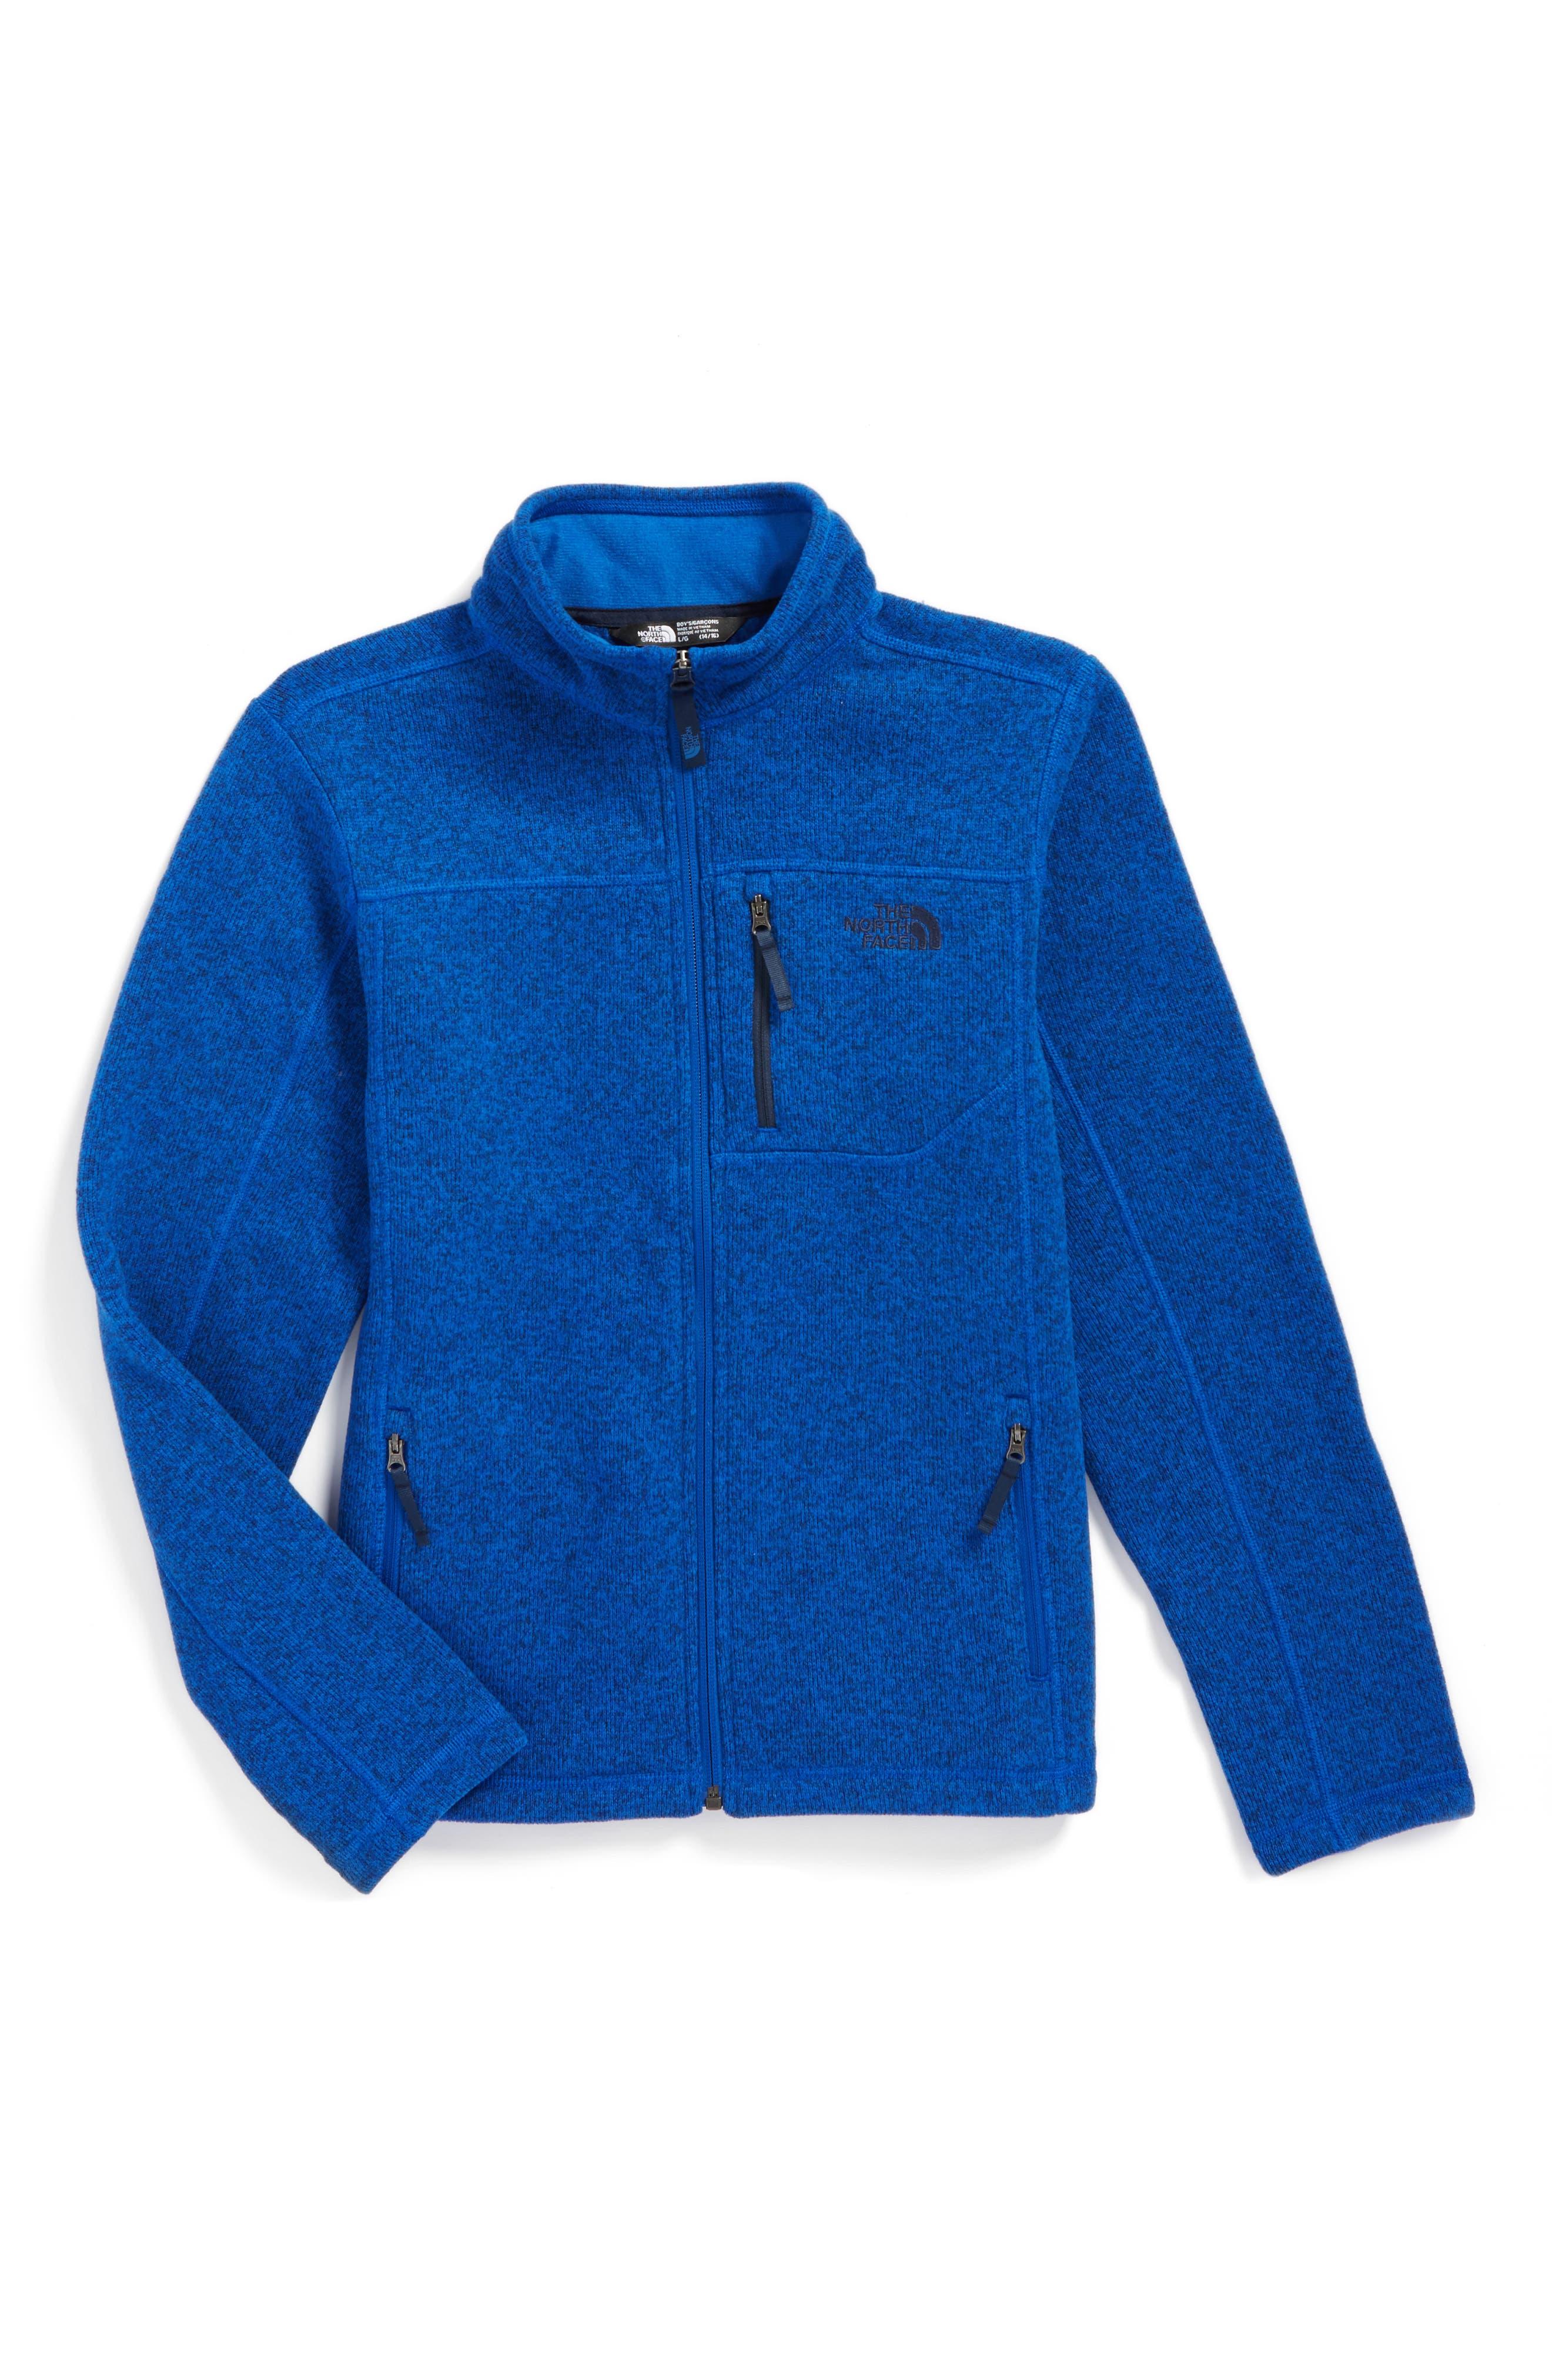 Gordon Lyons Sweater Fleece Zip Jacket,                             Main thumbnail 7, color,